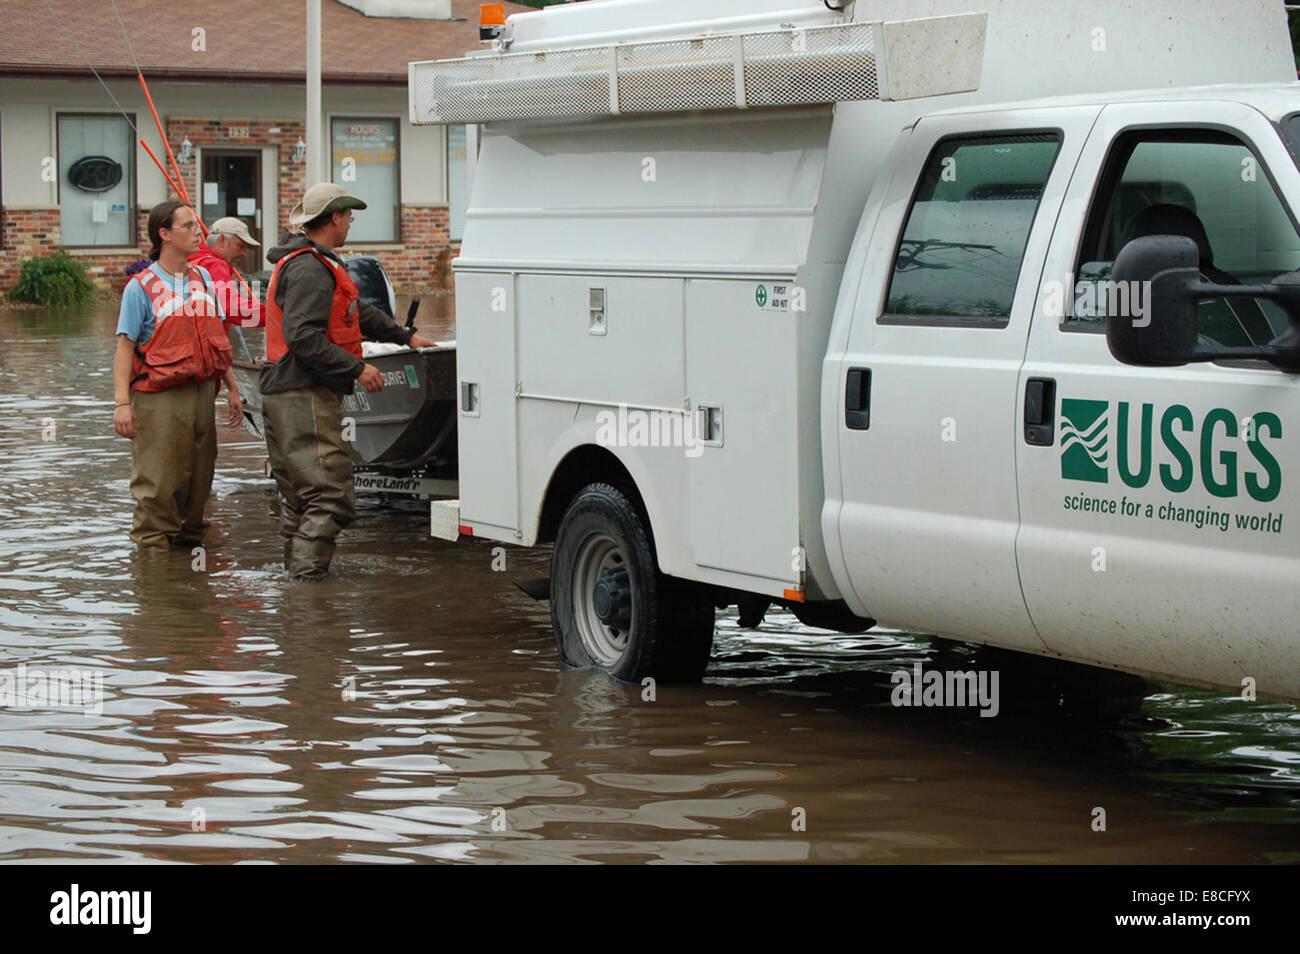 002 USGS Employees Deploying Boat, Cedar Rapids, IA - Stock Image